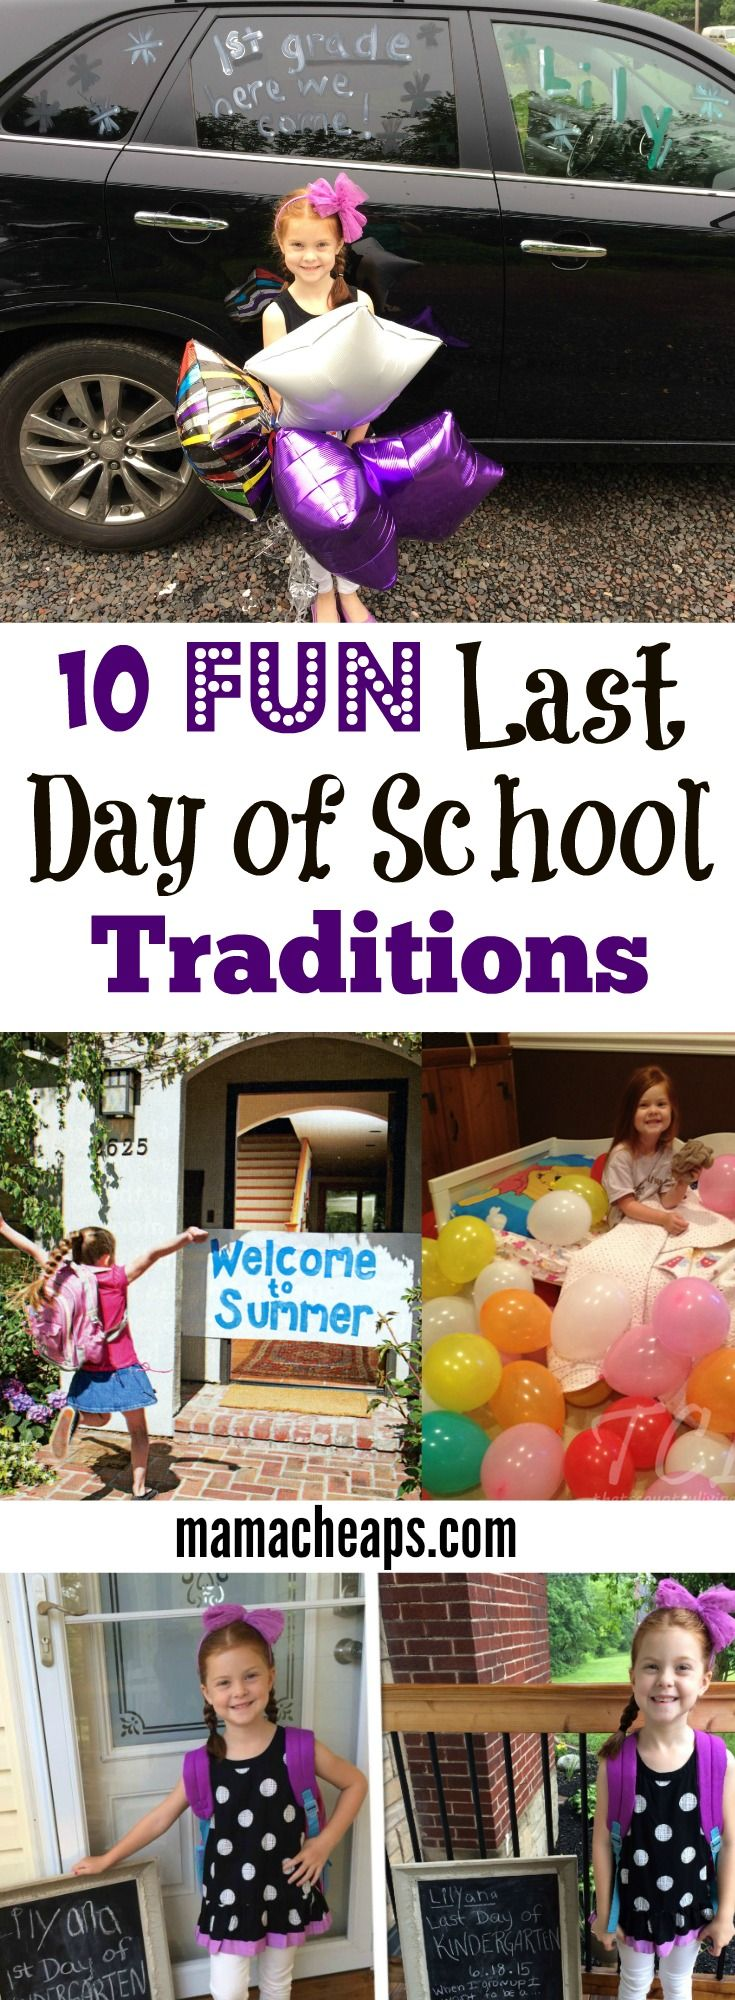 10 Fun Last Day of School Traditions